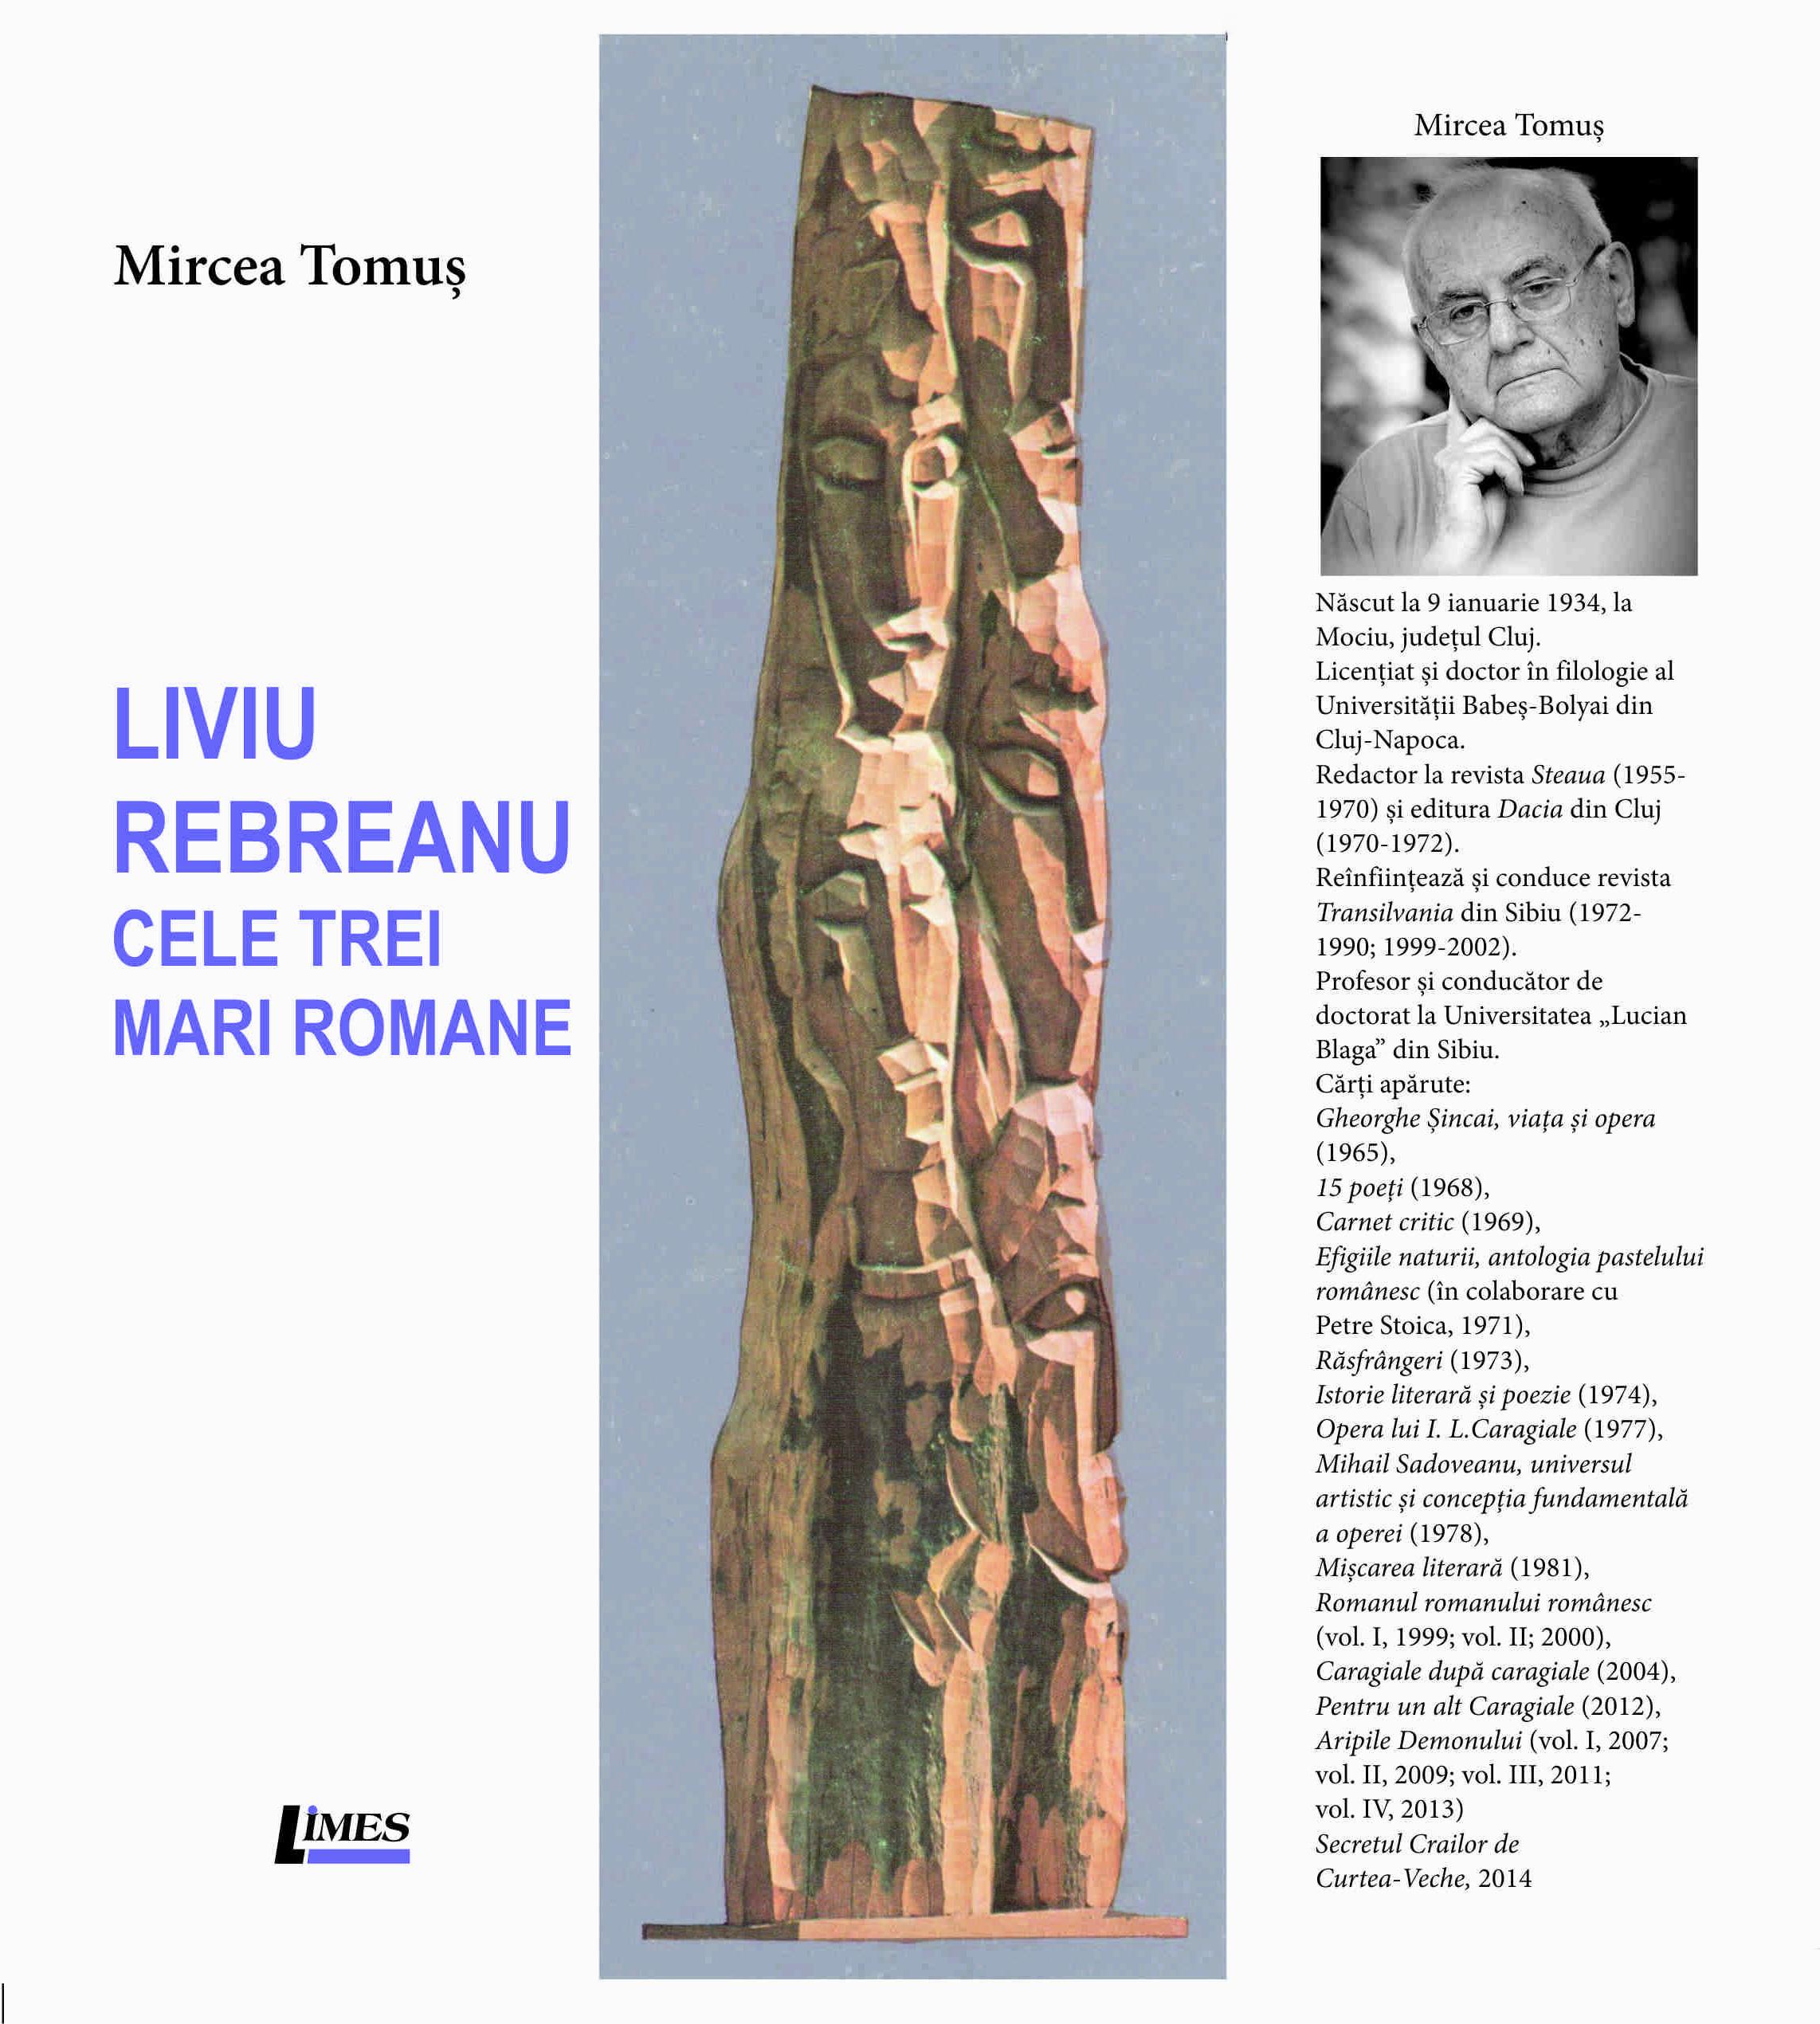 Liviu Rebreanu - Cele trei mari romane